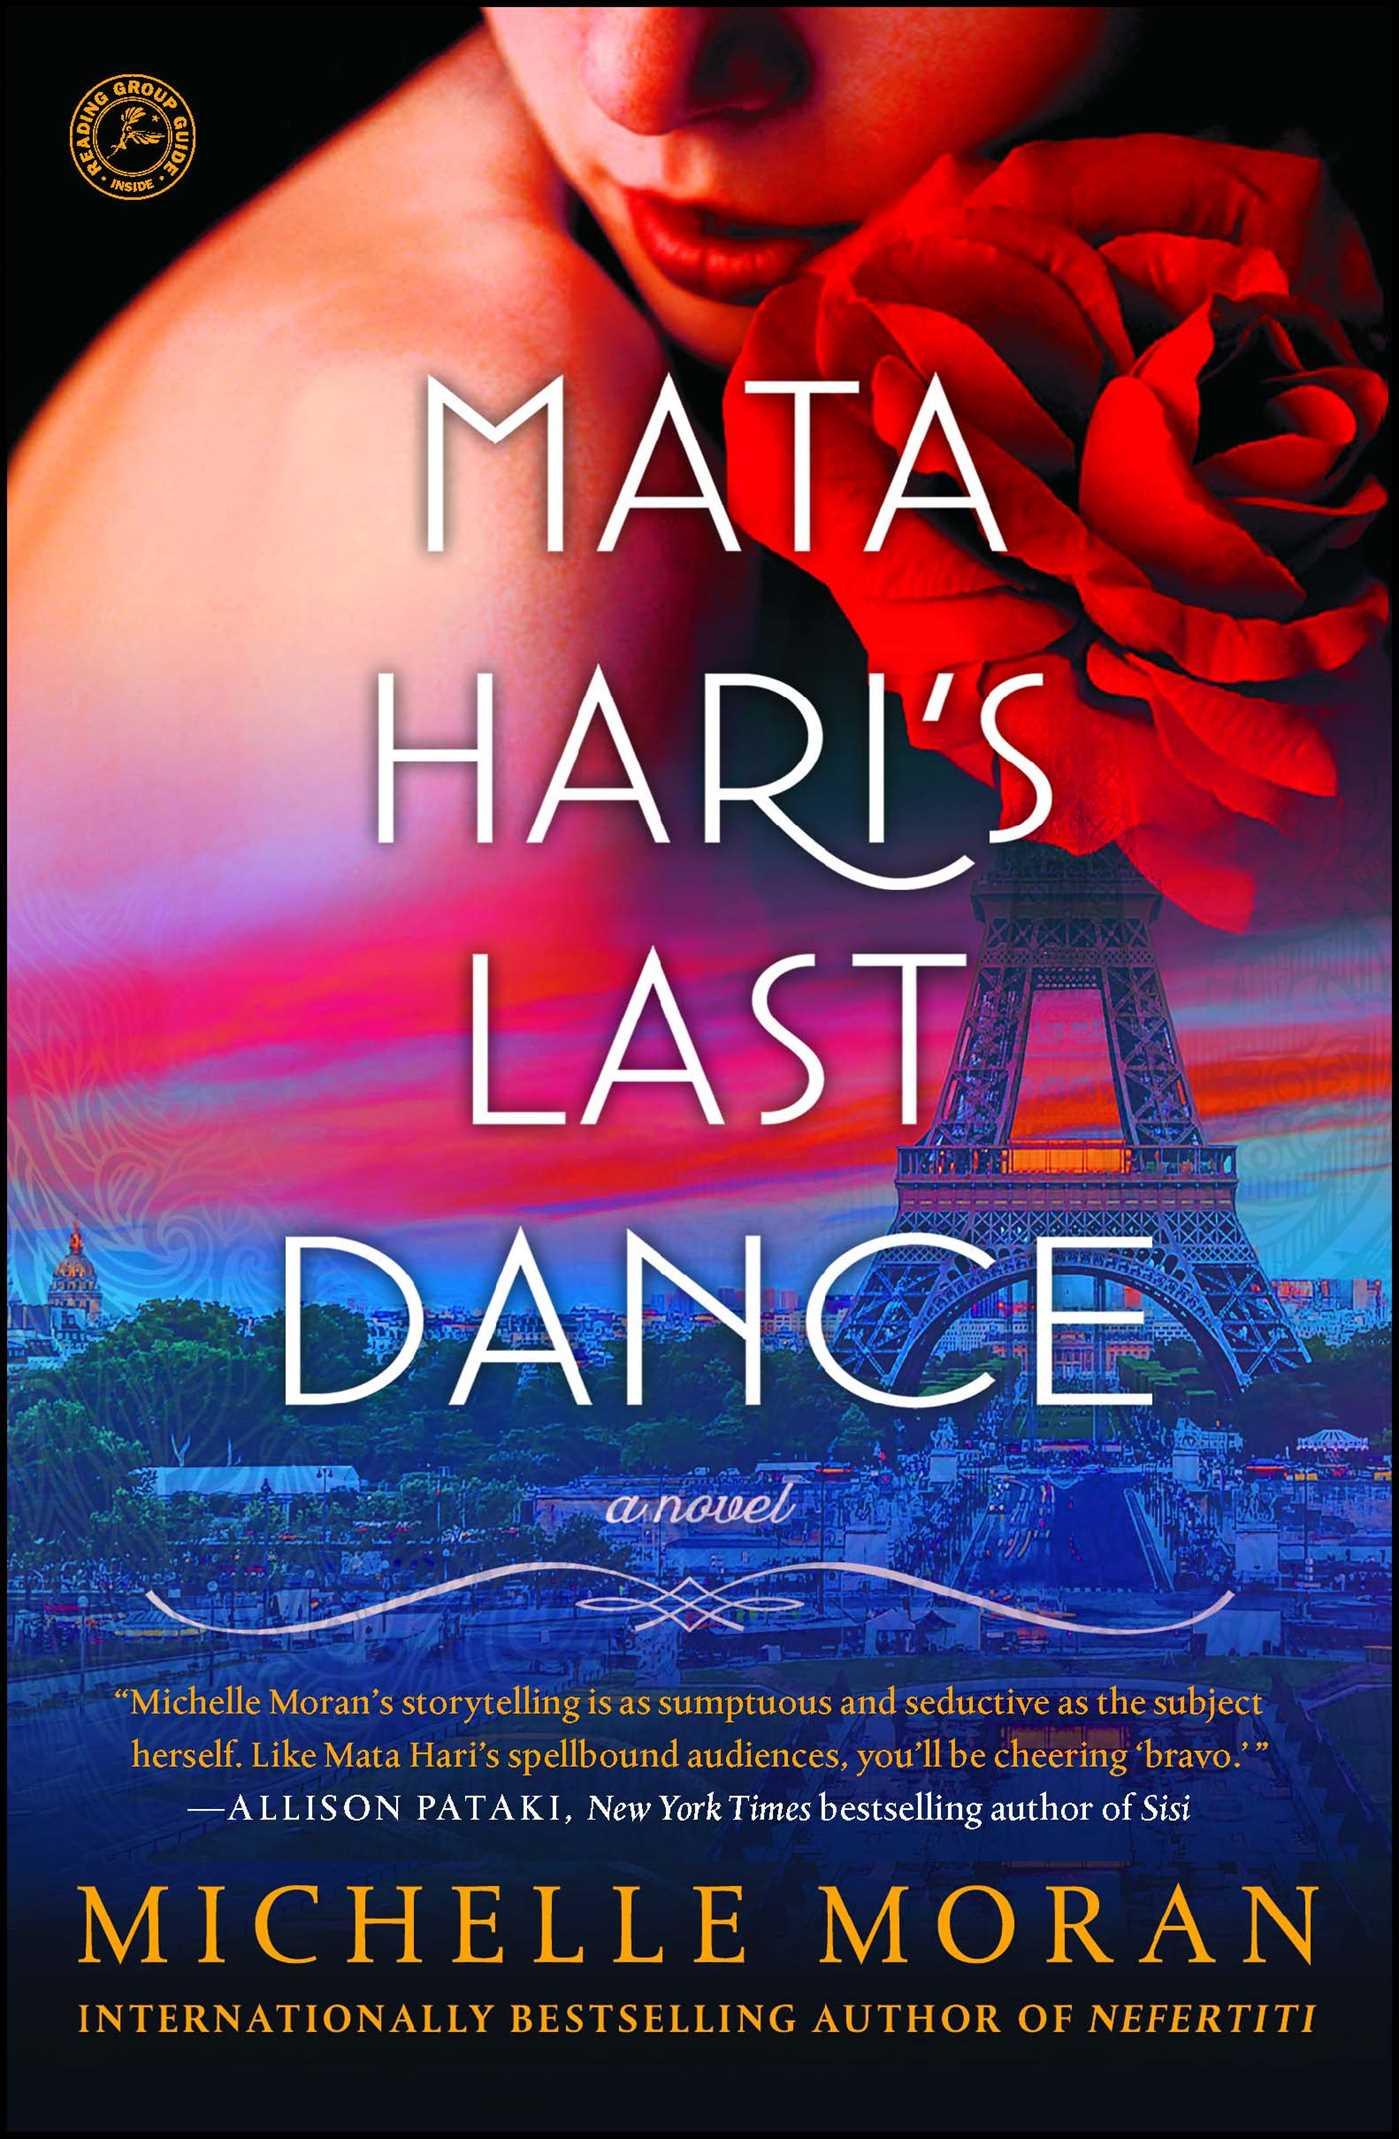 Mata haris last dance 9781476716381 hr